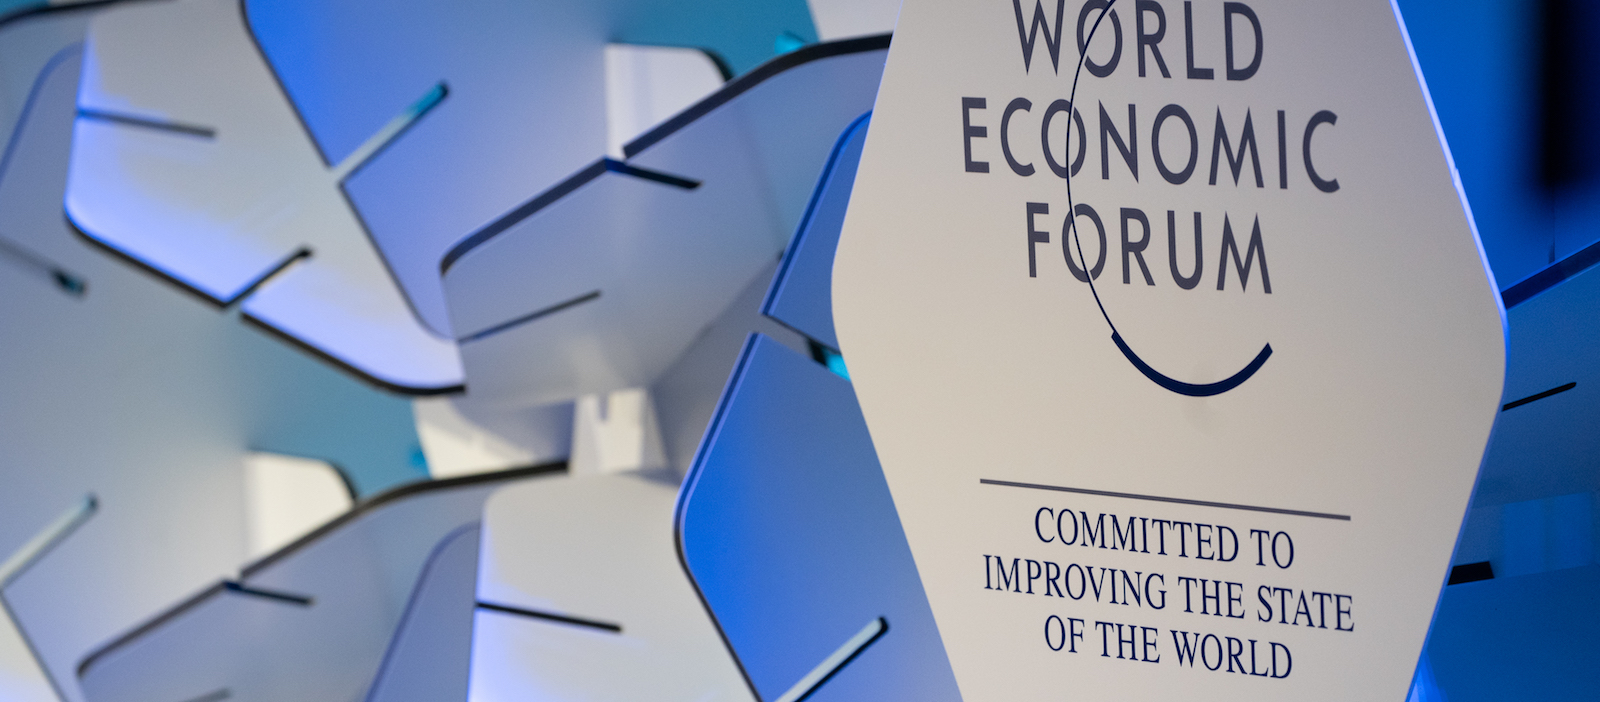 Photo: World Economic Forum/ Flickr